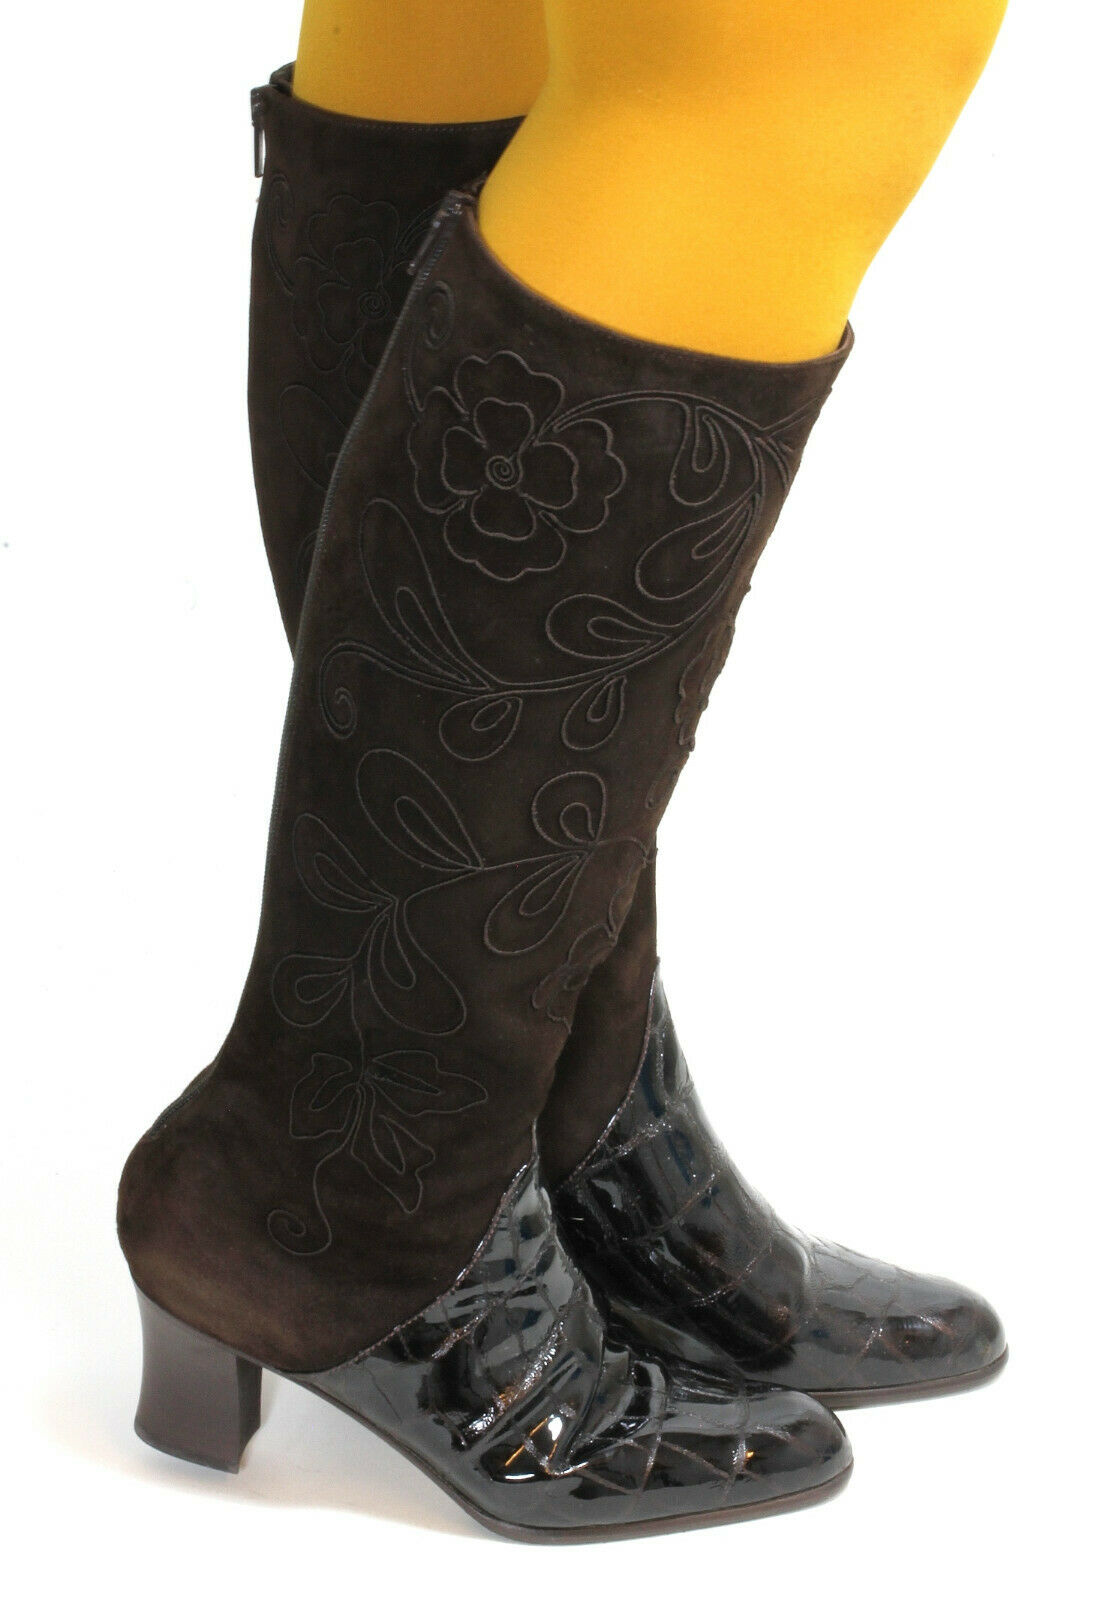 Damenstiefel Vintage Stiefel Leder Lack Blaumen Heels Zipper Stiefel Brunella 39